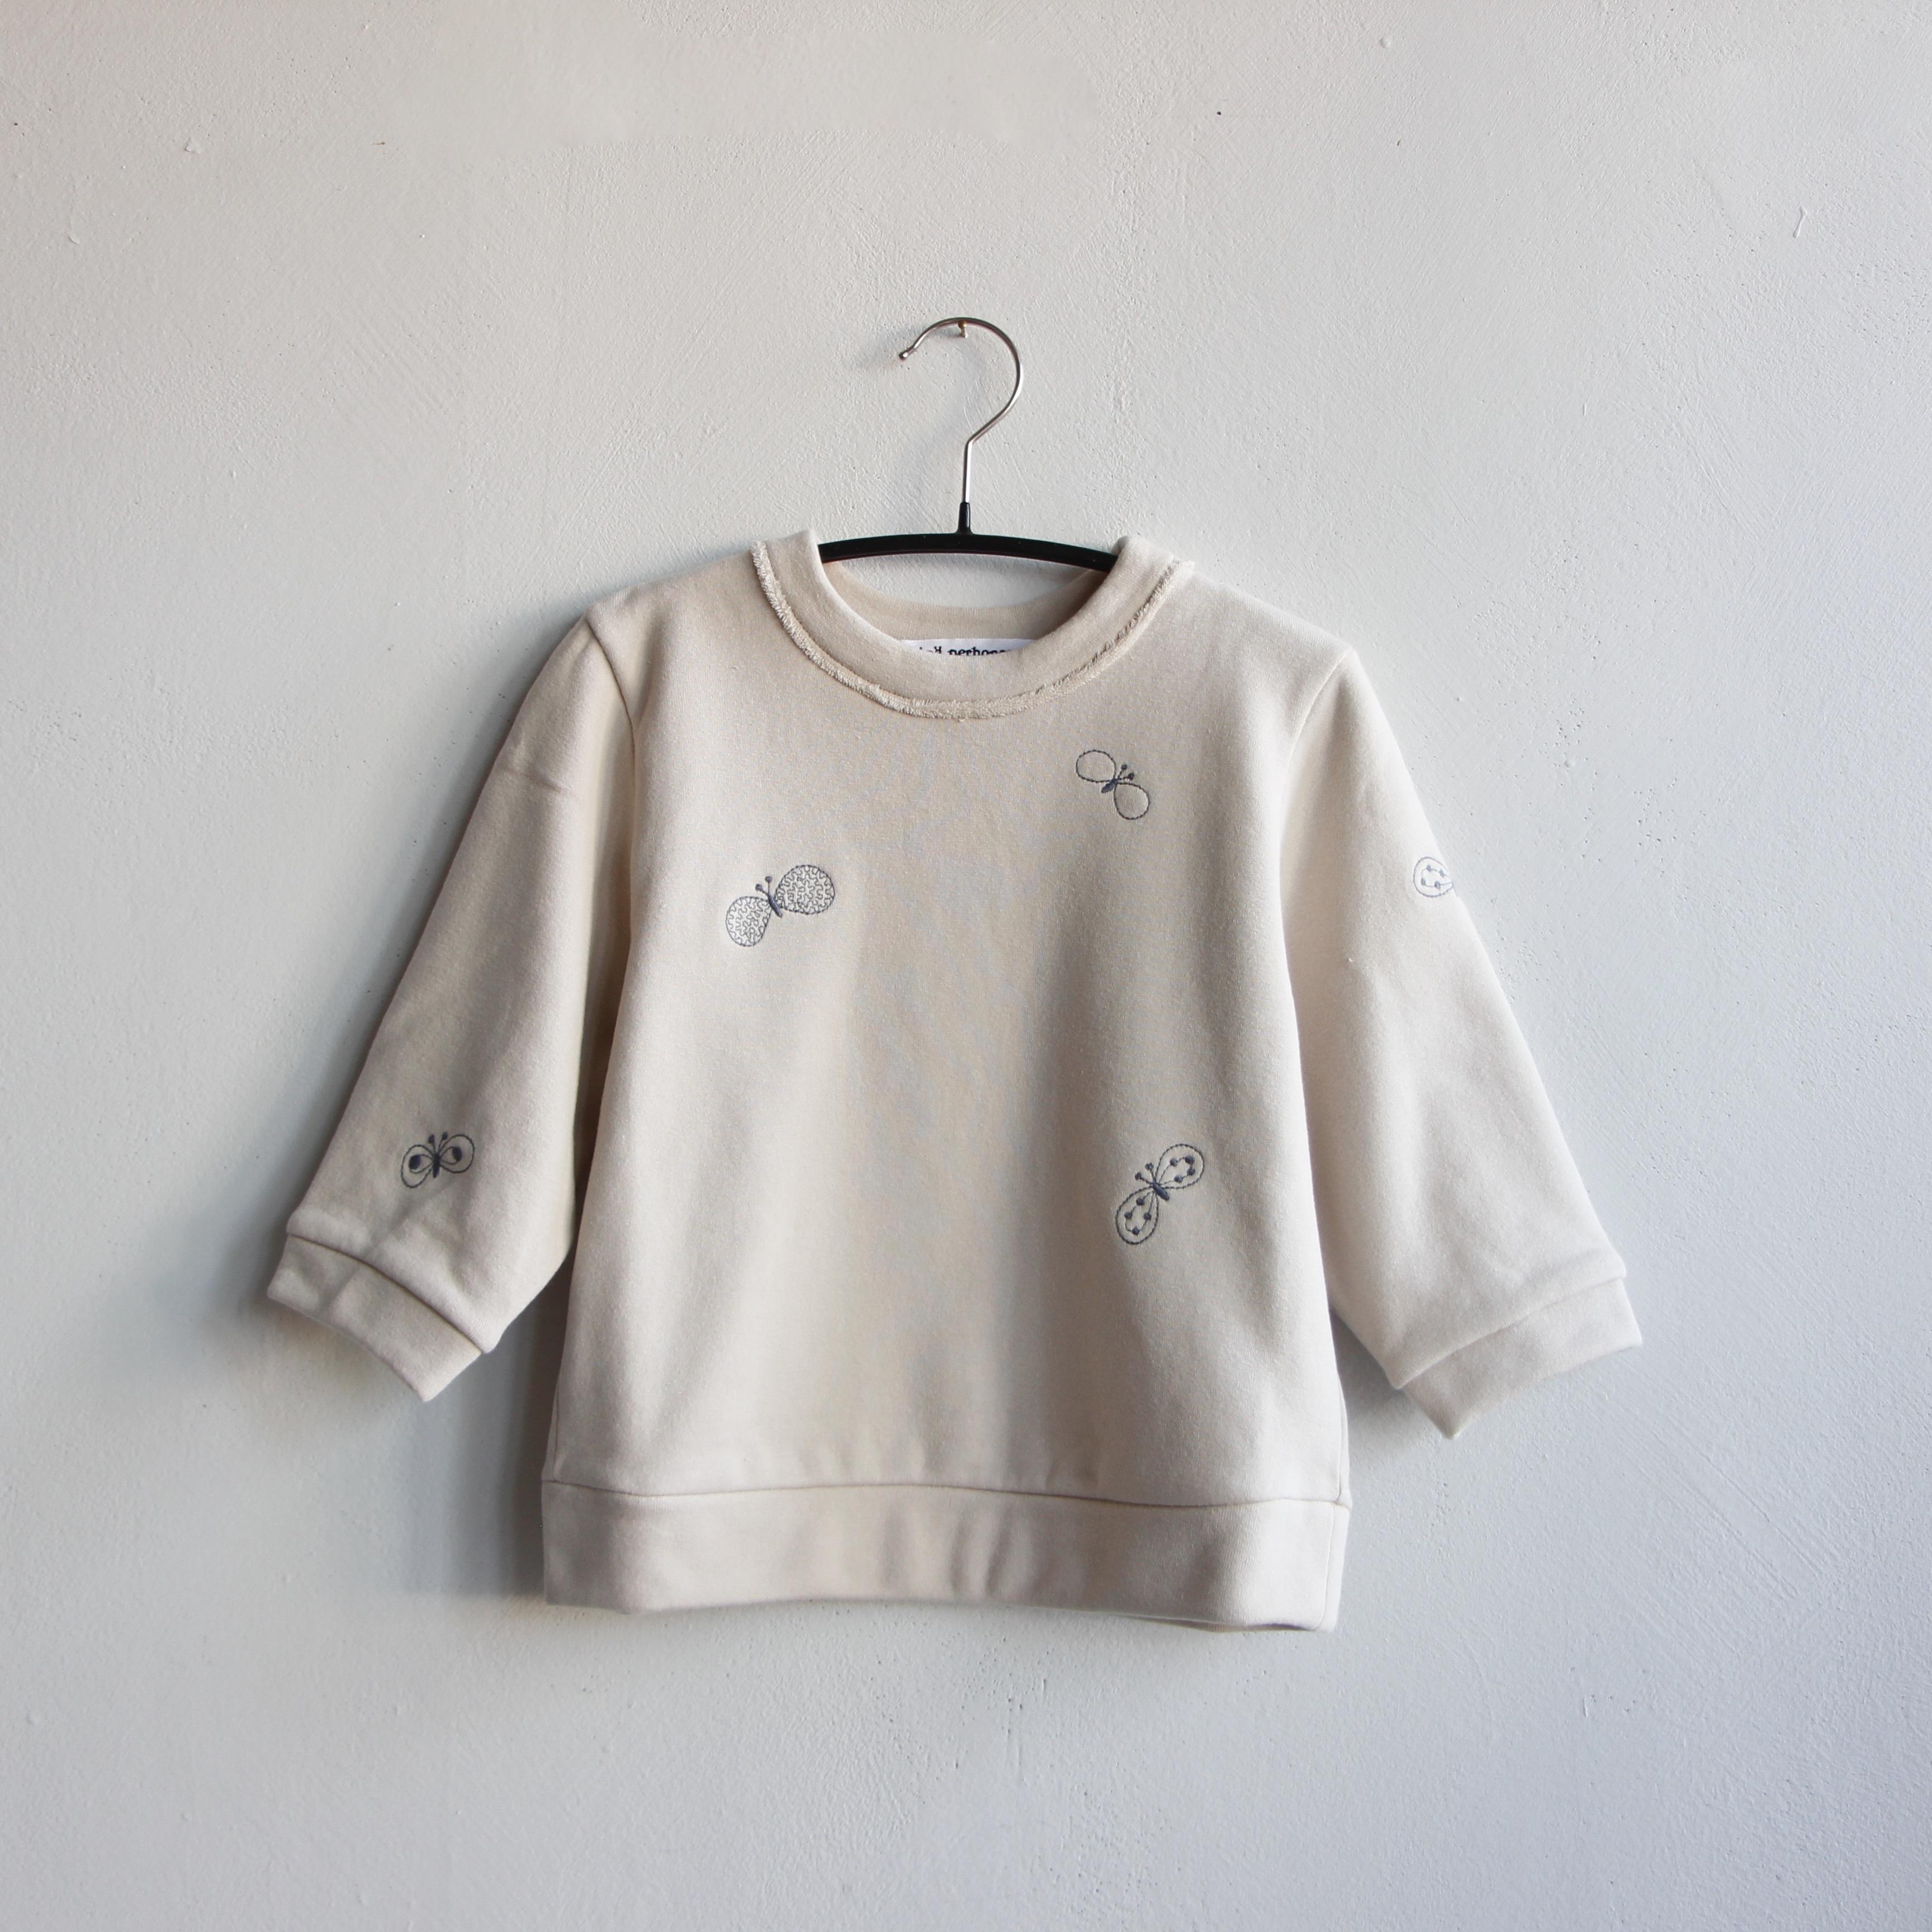 《mina perhonen 2020AW》choucho プルオーバー / beige / 80-100cm